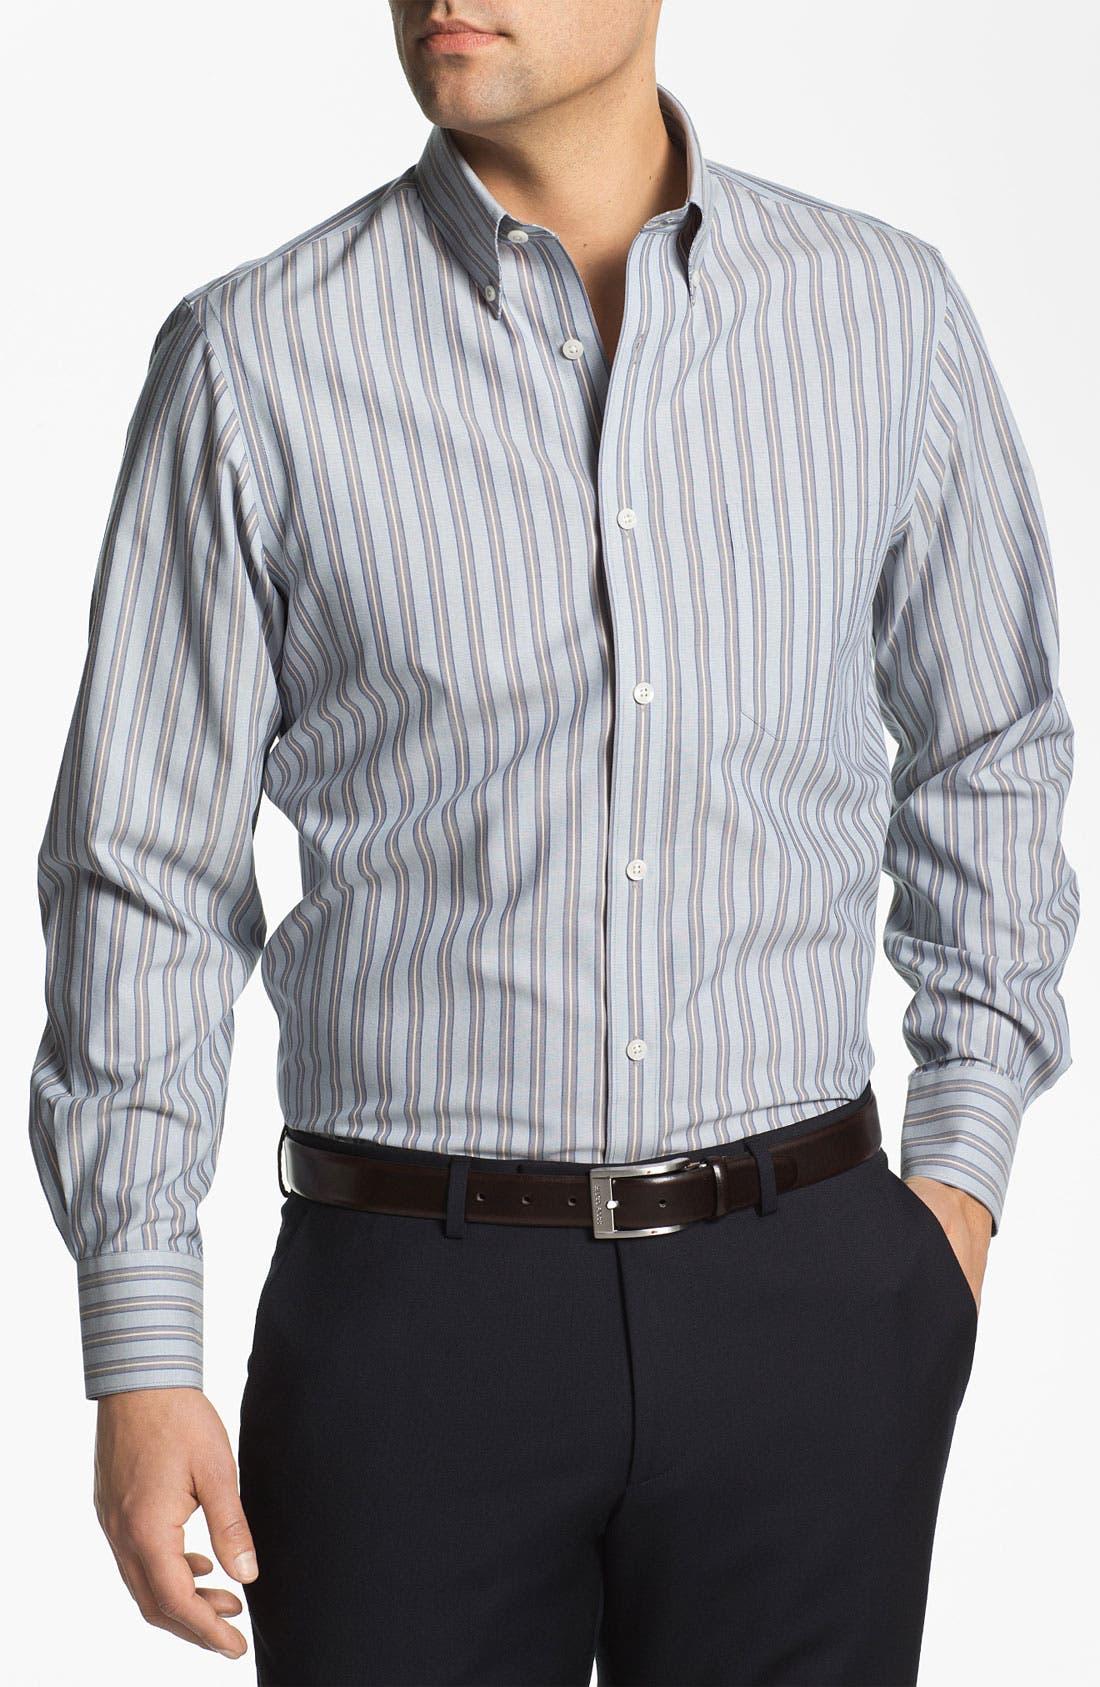 Main Image - Nordstrom Regular Fit Sport Shirt